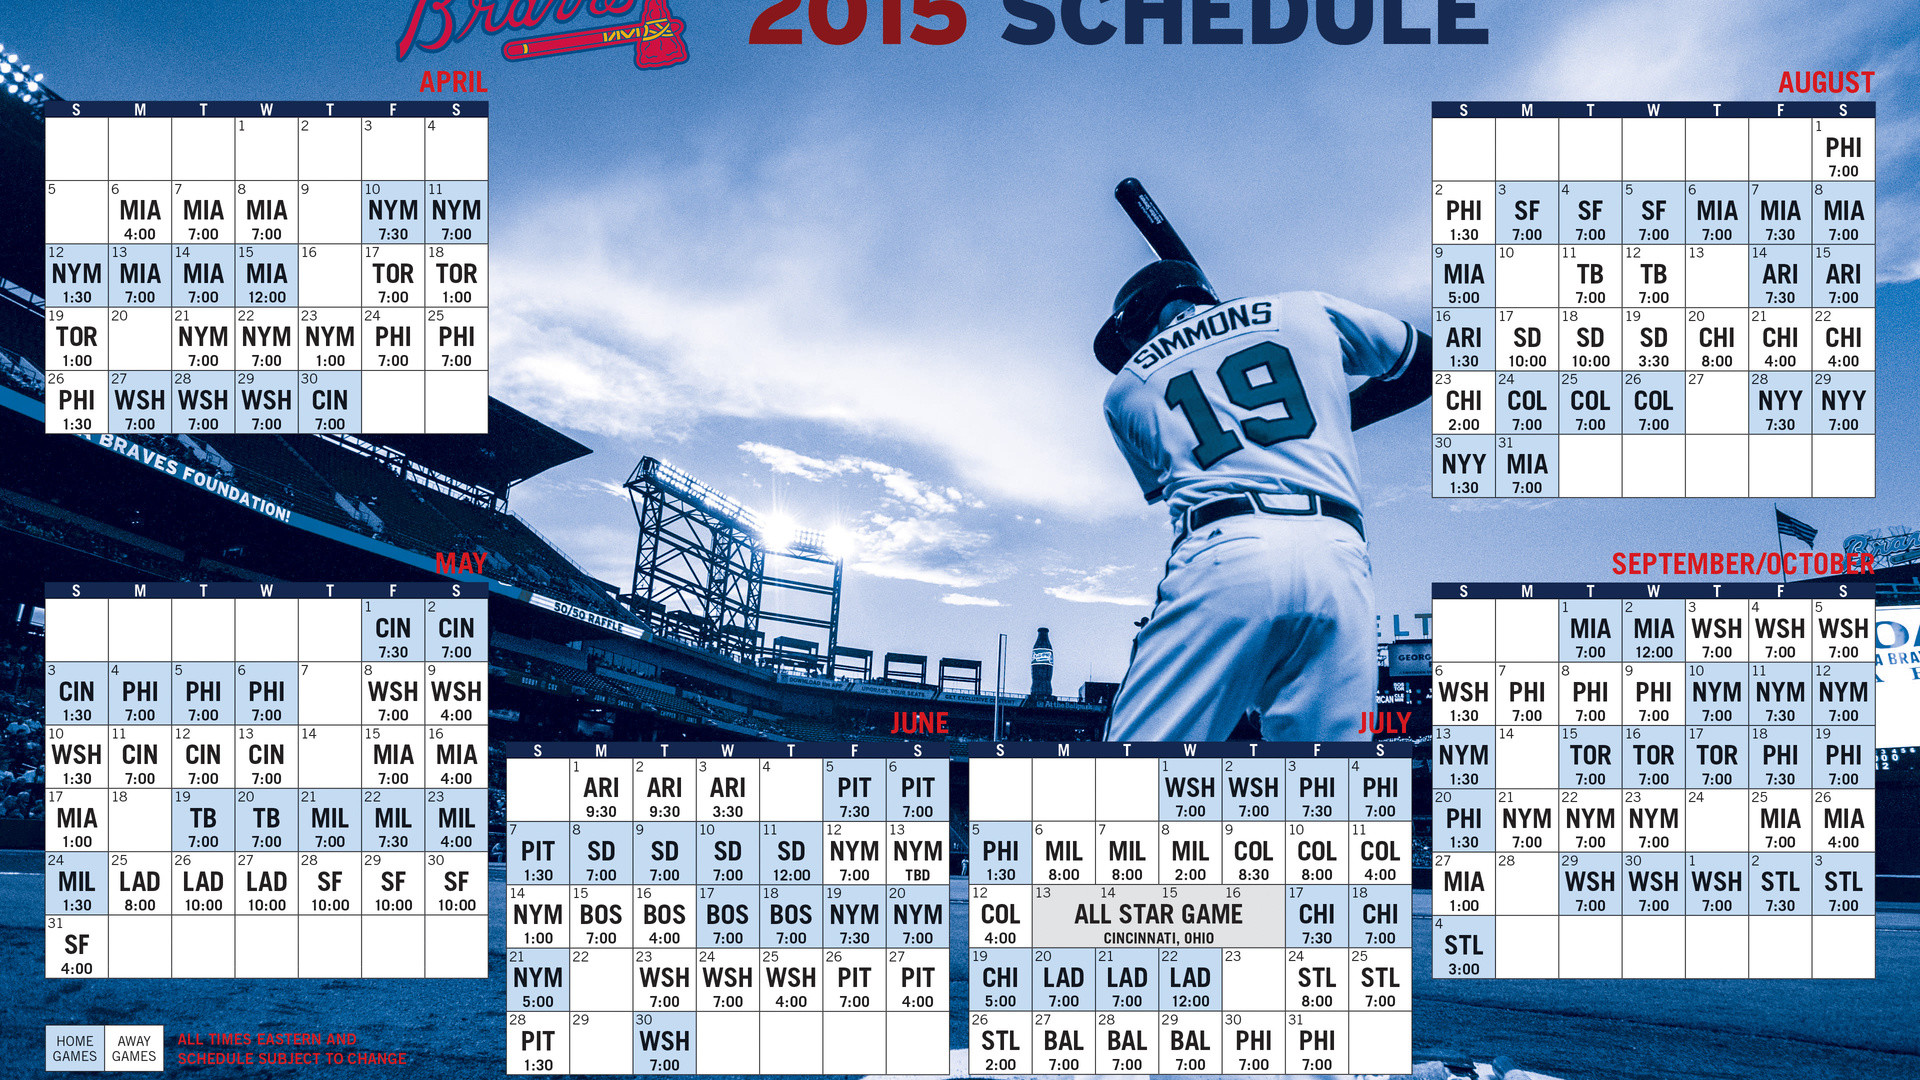 Atlanta Braves, Schedule, Mlb, Braves, Baseball, Sports, 2015, Atlanta